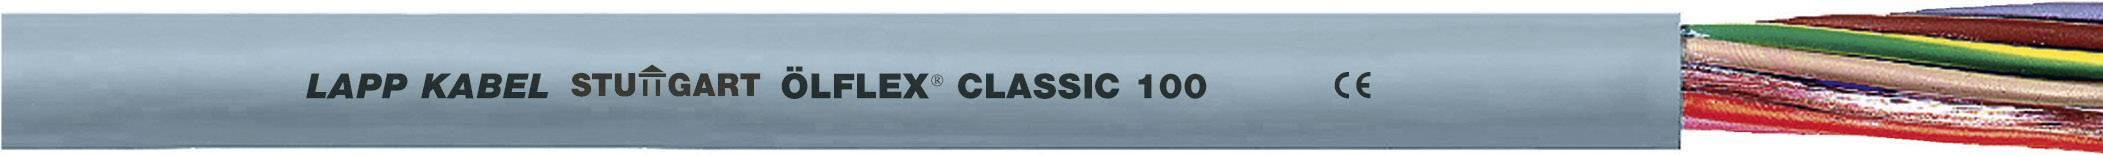 Kabel LappKabel Ölflex CLASSIC 100 6G1 (0010045), PVC, 8 mm, 500 V, šedá, 50 m